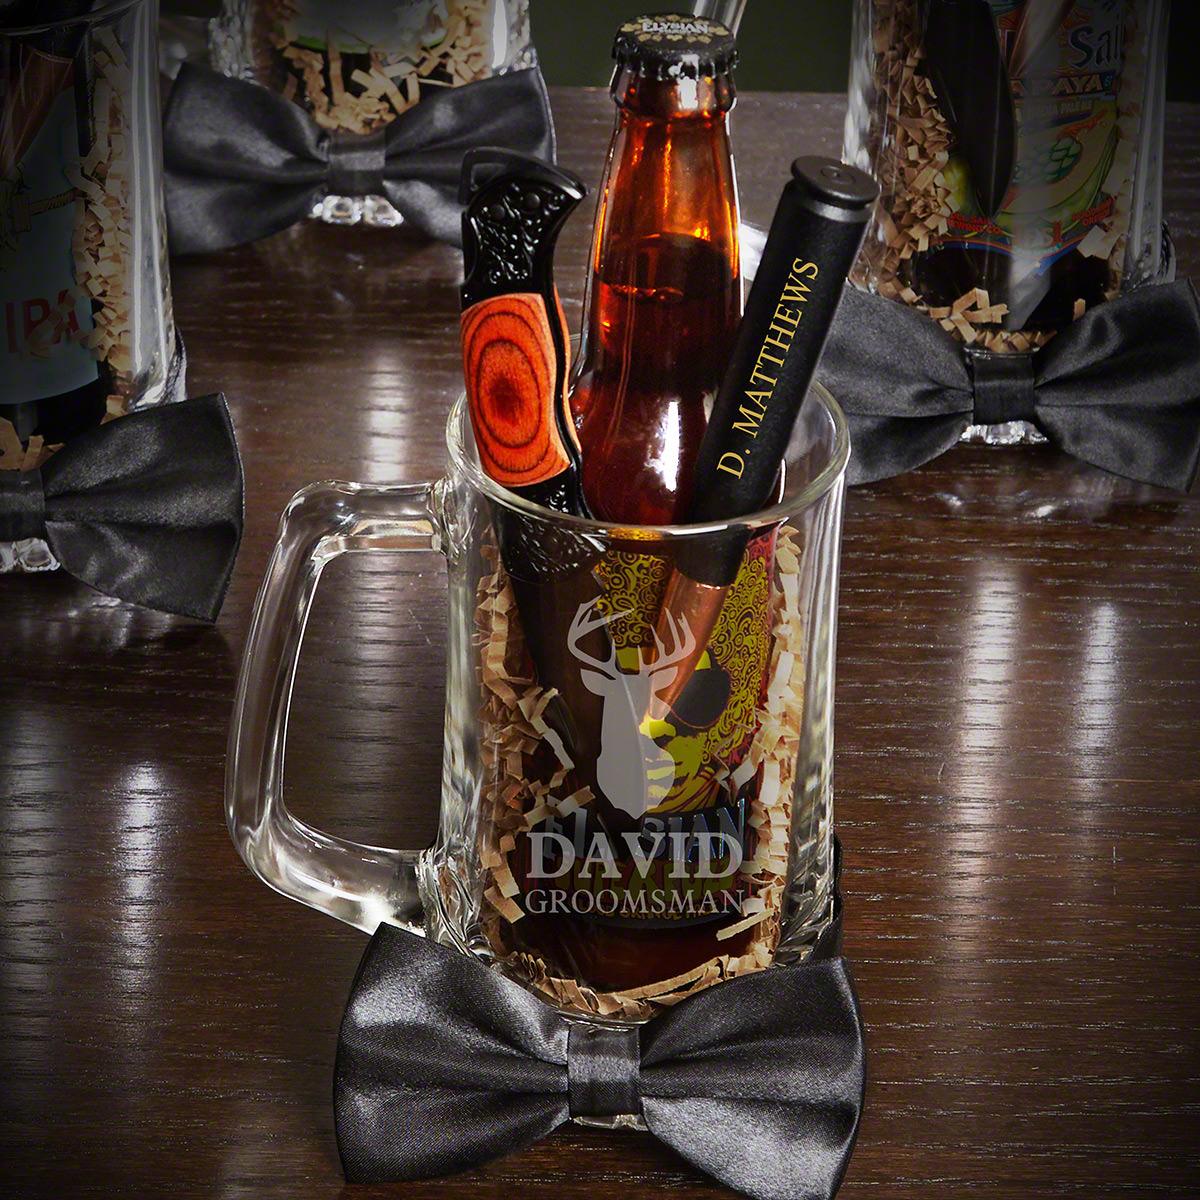 Woodlands-Personalized-Beer-Mug-Groomsman-Gift-Set